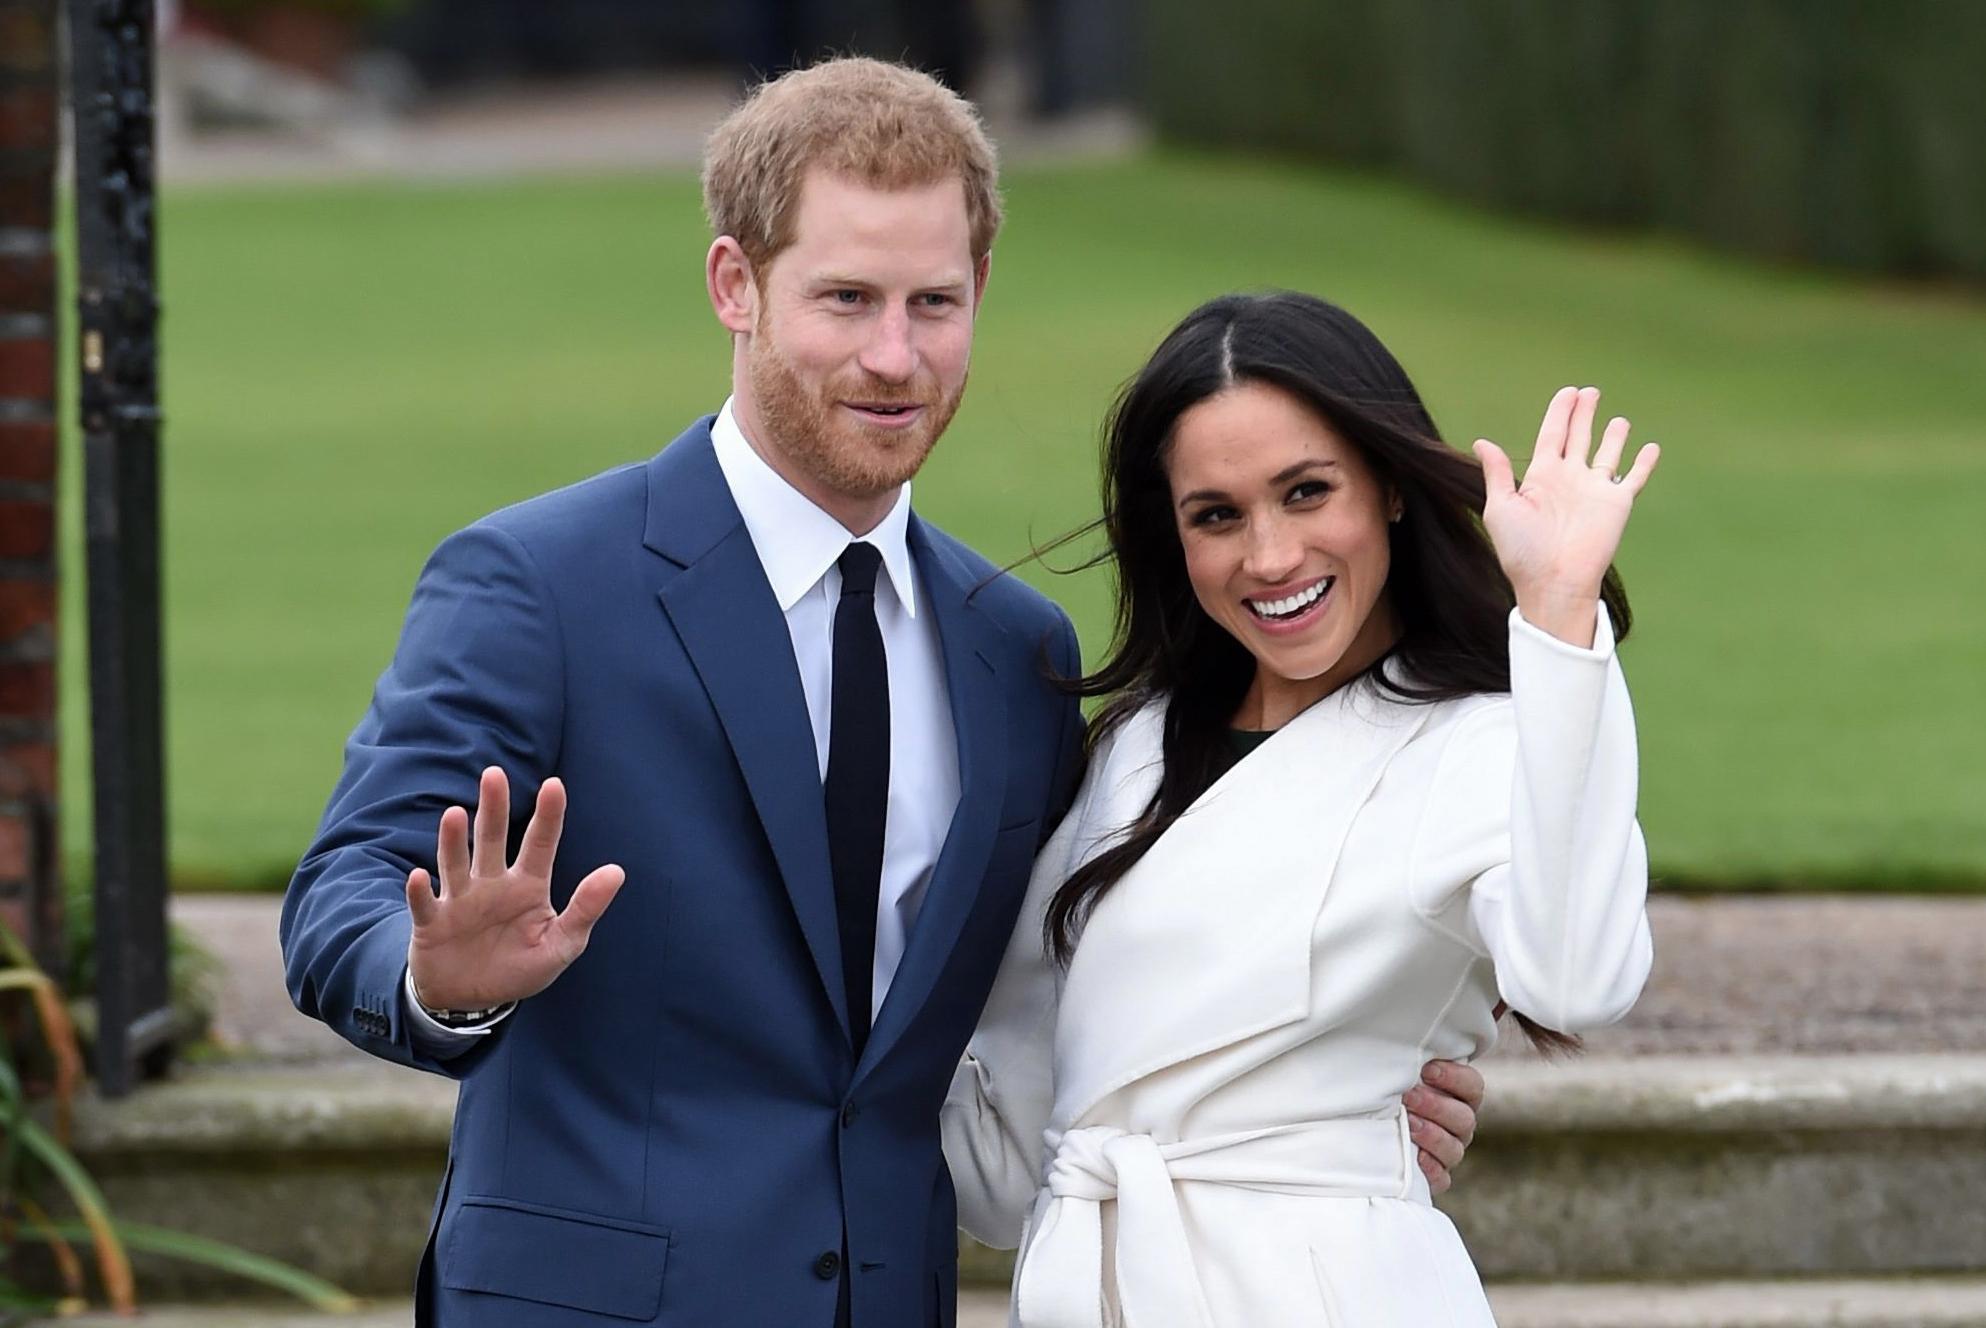 Royal_Wedding-Meghan_Markle_77446-159532.jpg00909685